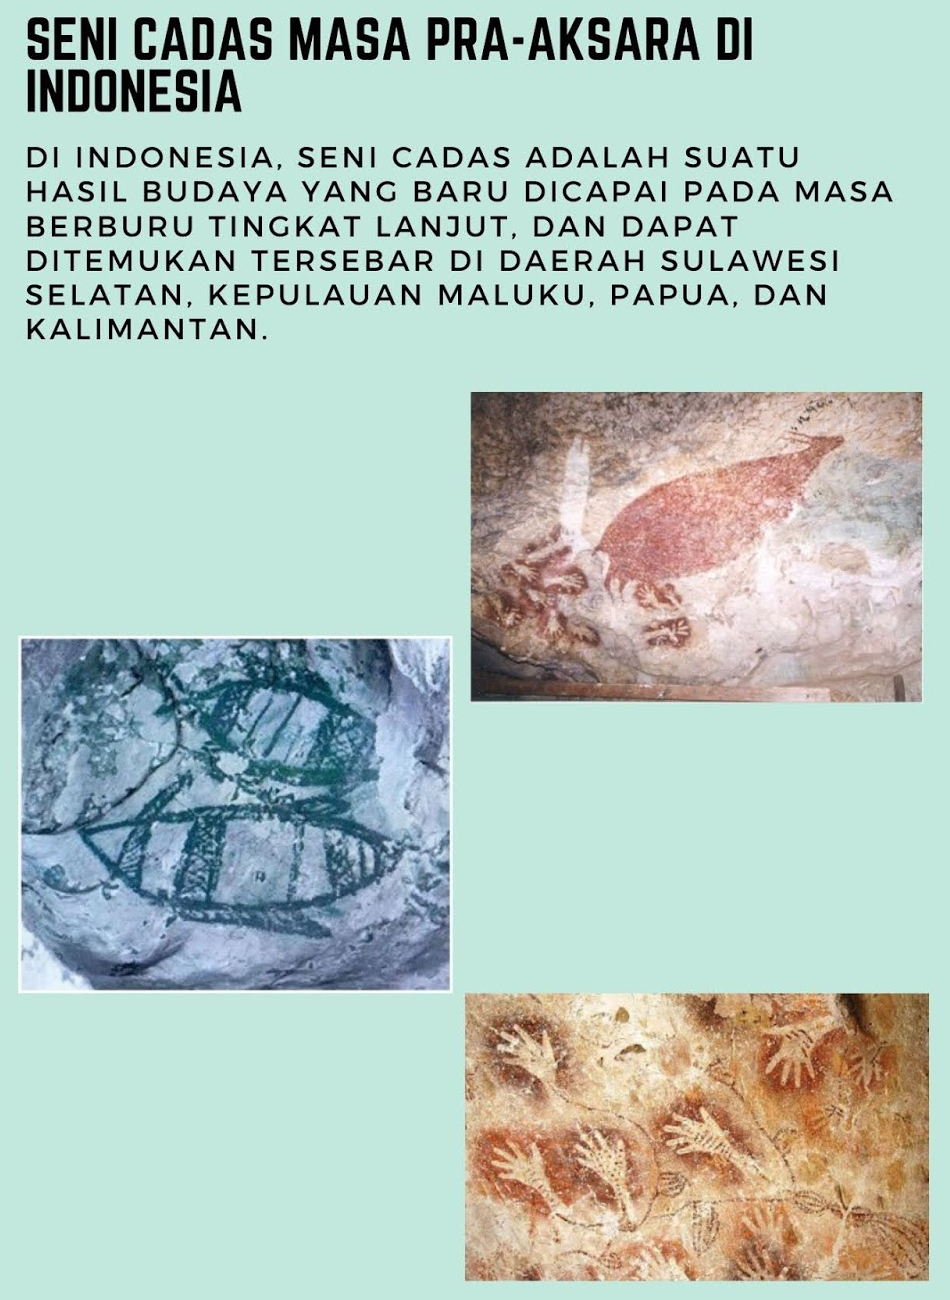 situs Leang Pattae, seni cadas, lukisan di dinding gua, lukisan didinding gua, peninggalan pra-aksara, peninggalan pra-sejarah, peninggalan praaksara, peninggalan prasejarah, lukisan didinding gua peninggalan masa